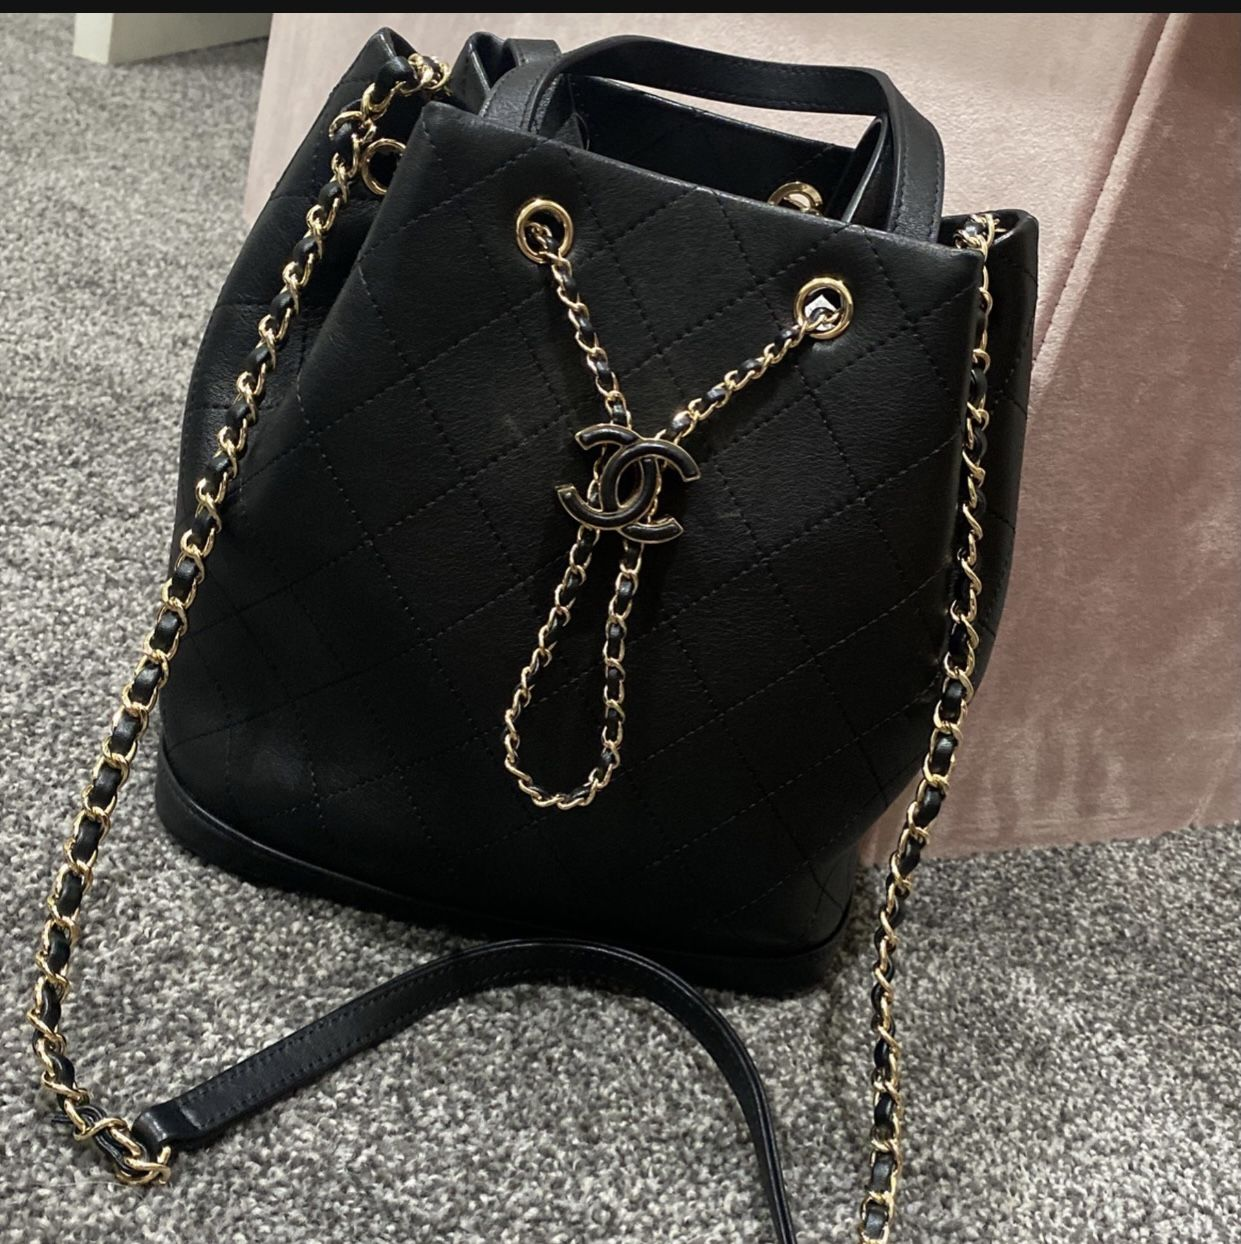 Chanel Bucket Bag Purse Crossbody